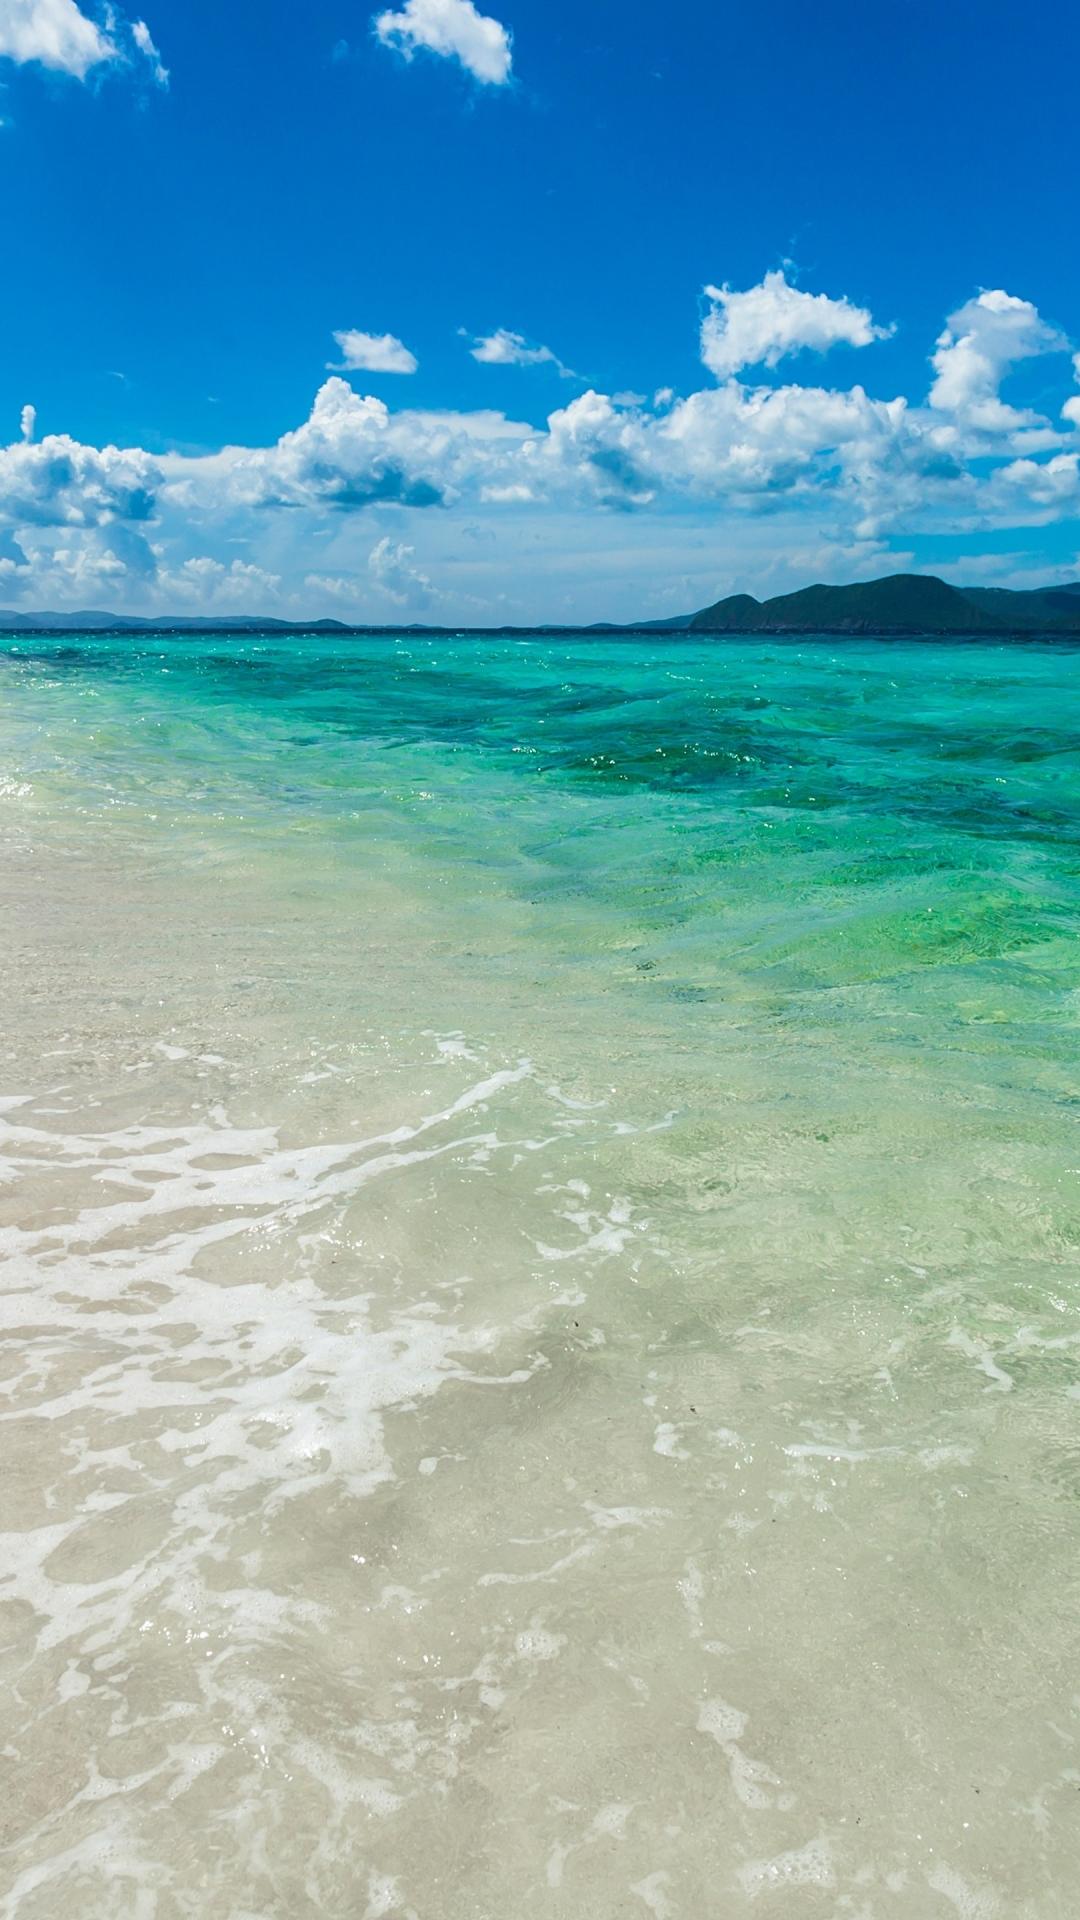 178 Ocean Apple IPhone 7 Plus 1080x1920 Wallpapers